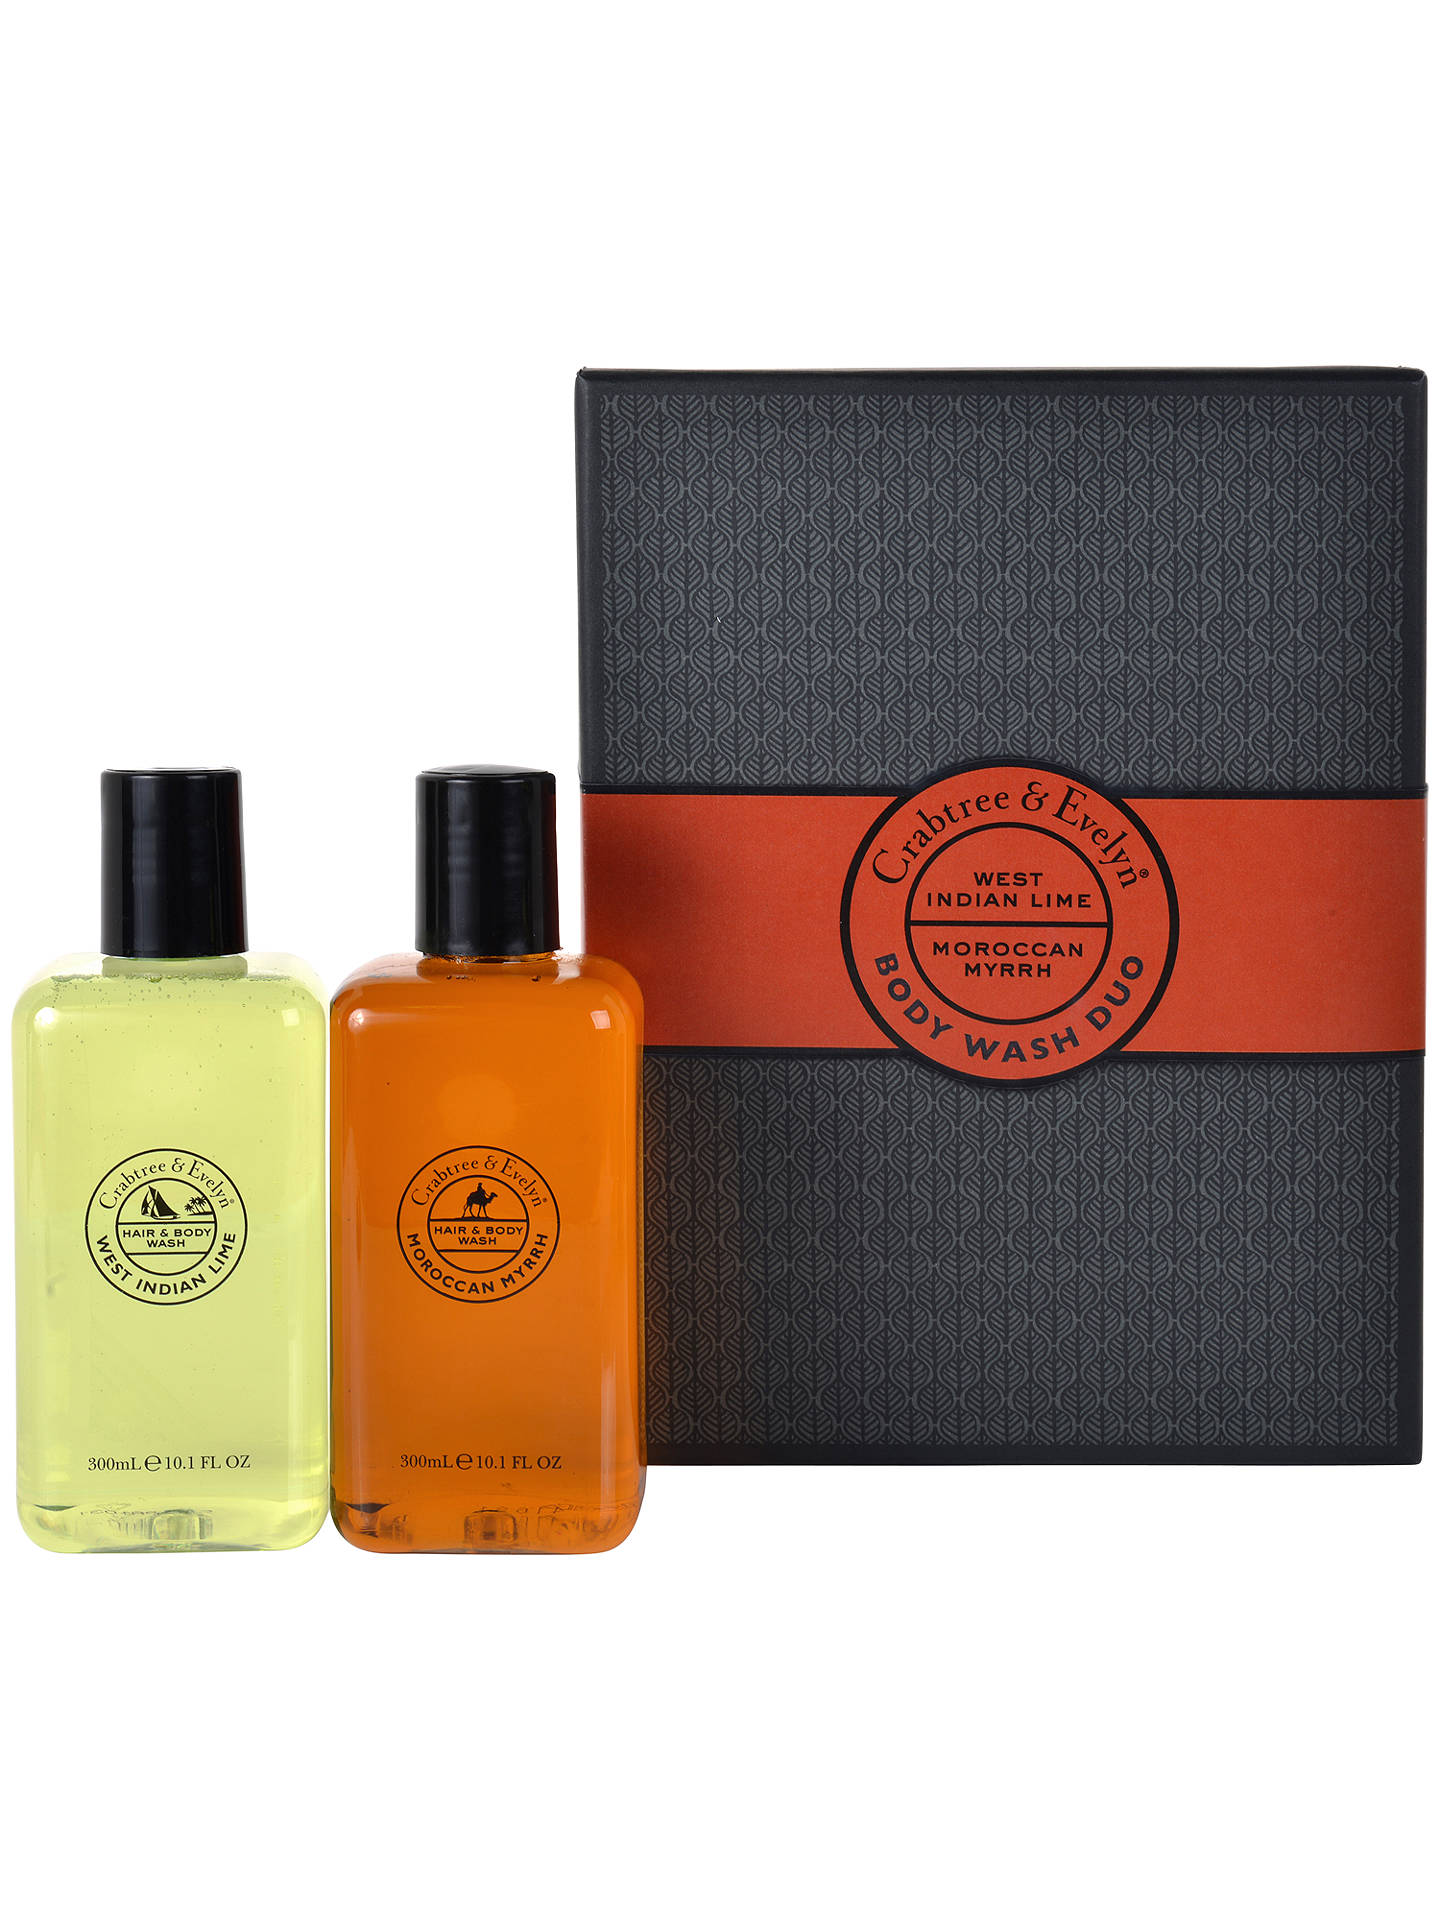 Buy Crabtree & Evelyn Men's Body Wash Gift Set Online at johnlewis.com